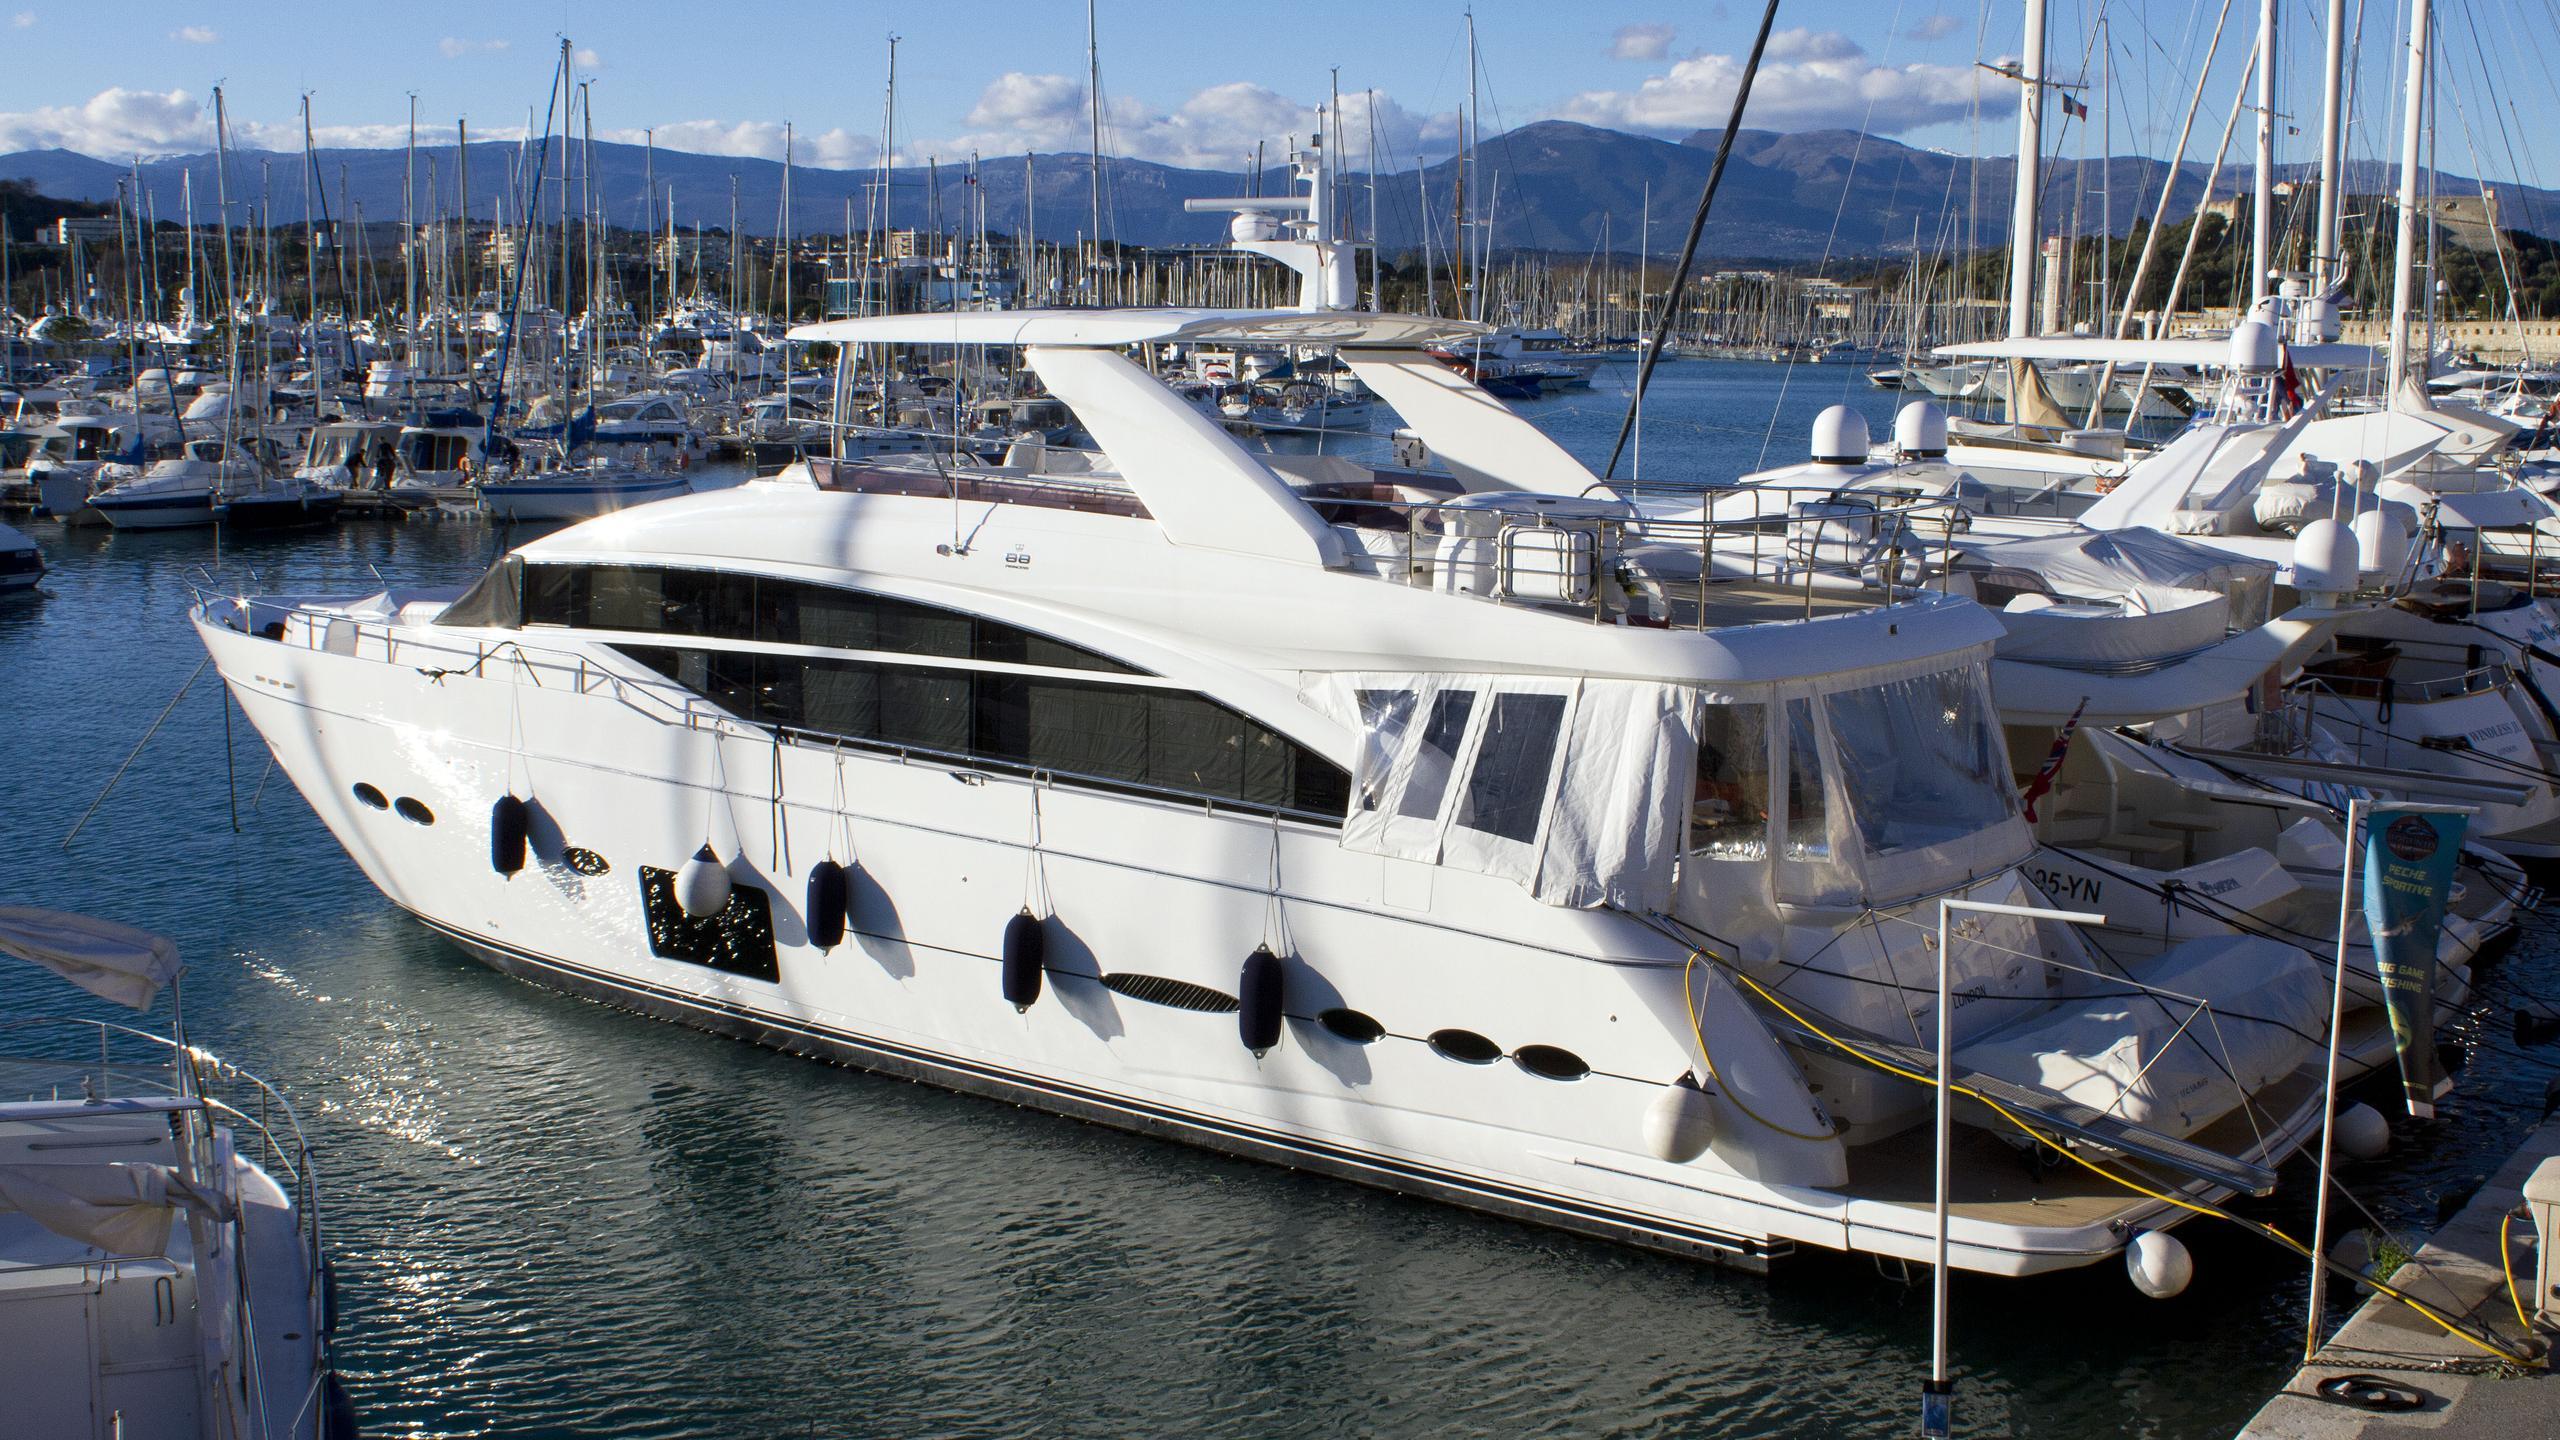 minx-motor-yacht-princess-88-2015-27m-rear-profile